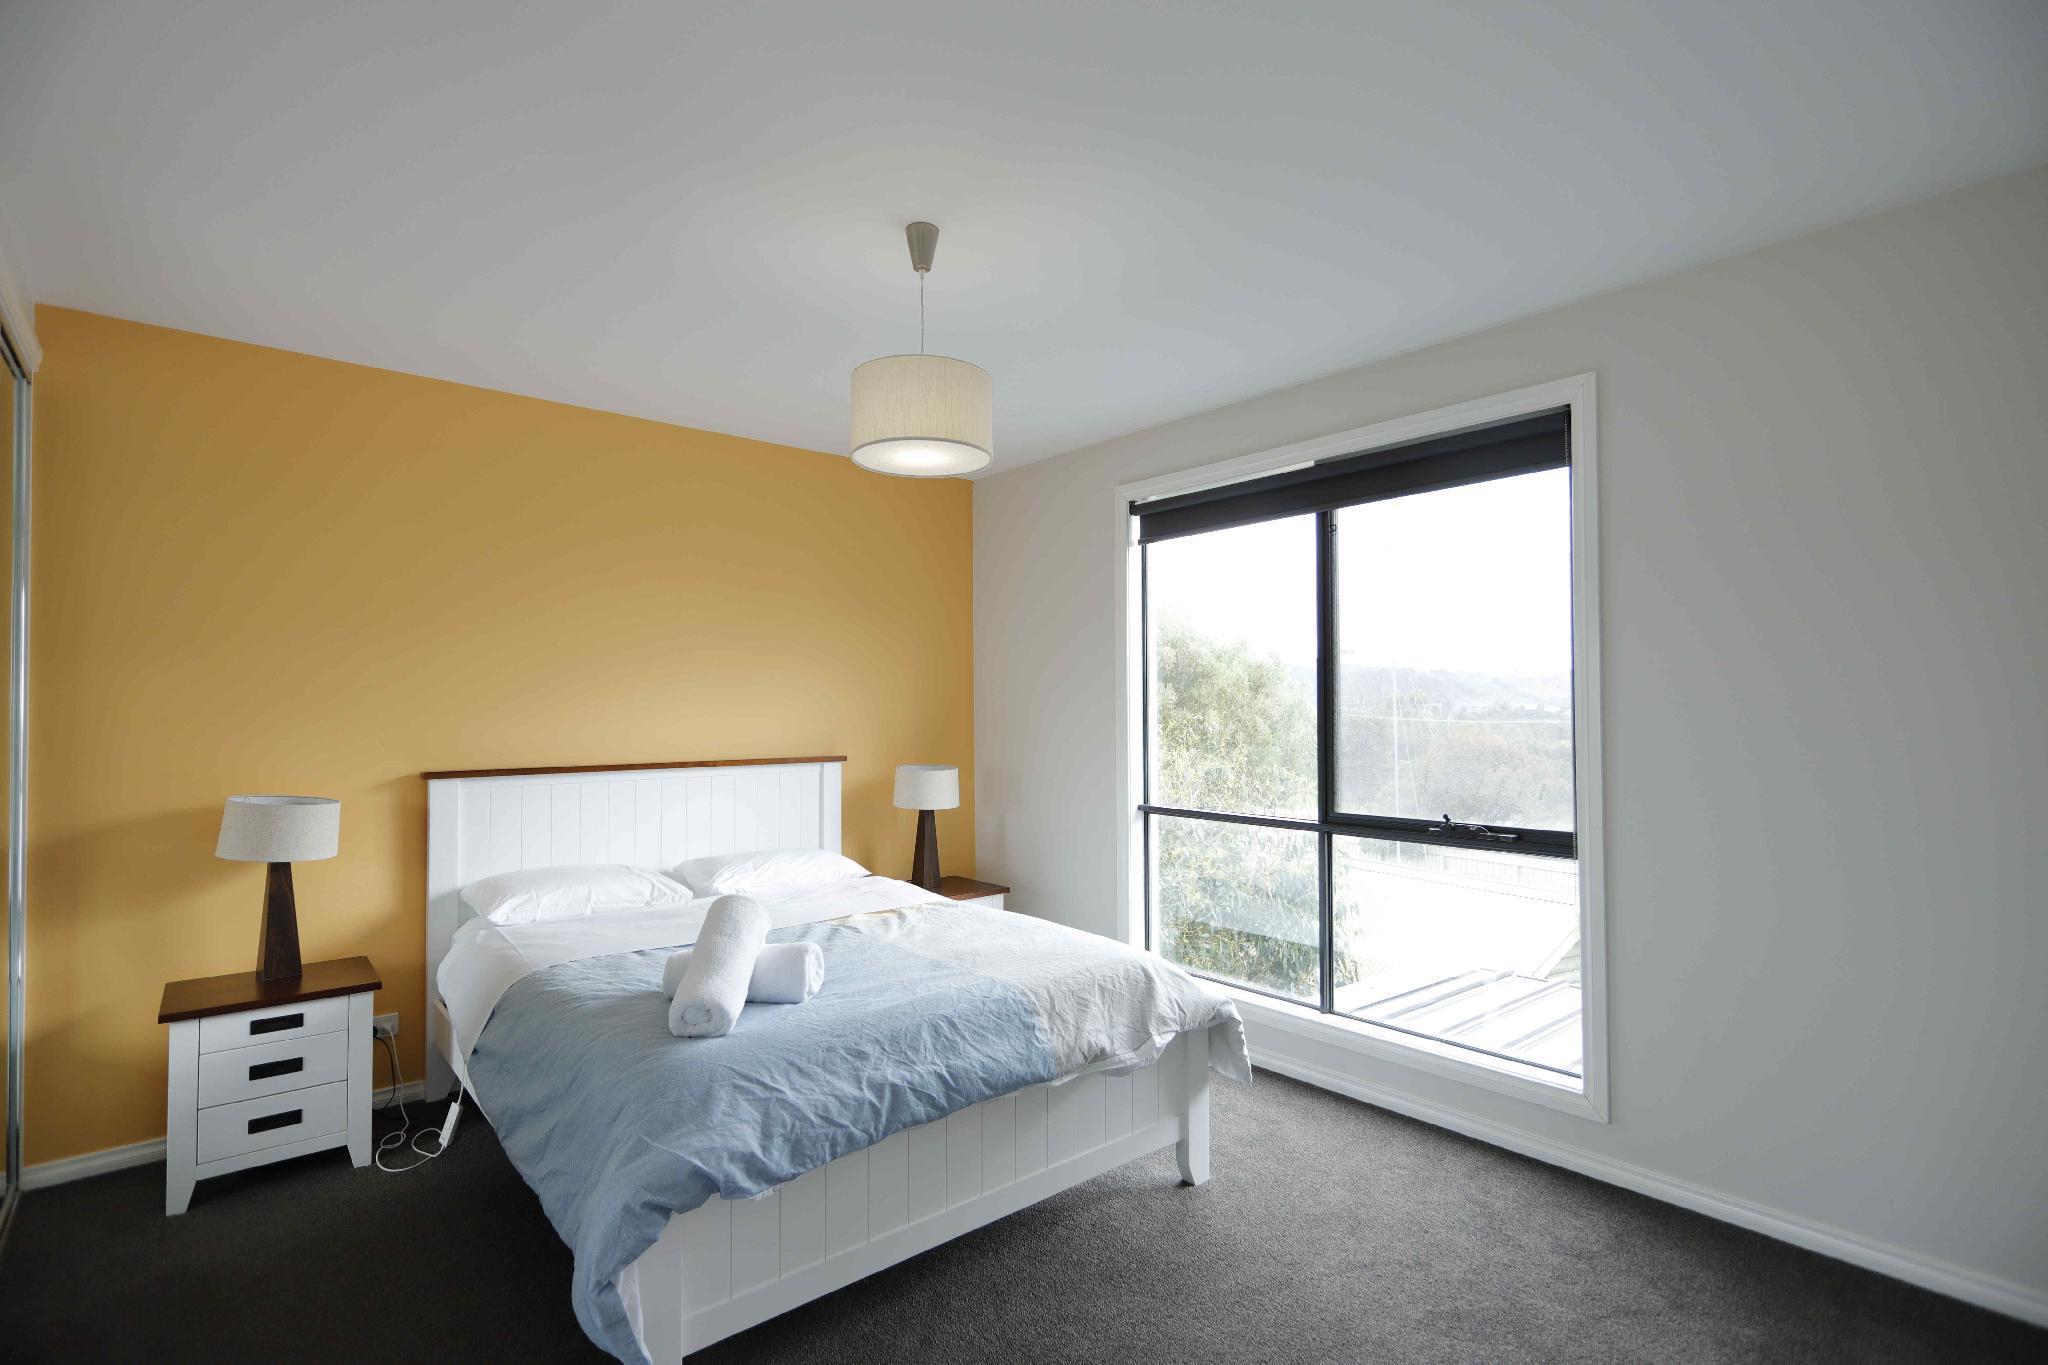 Apollo Bay Seal Apartments, Colac-Otway - South